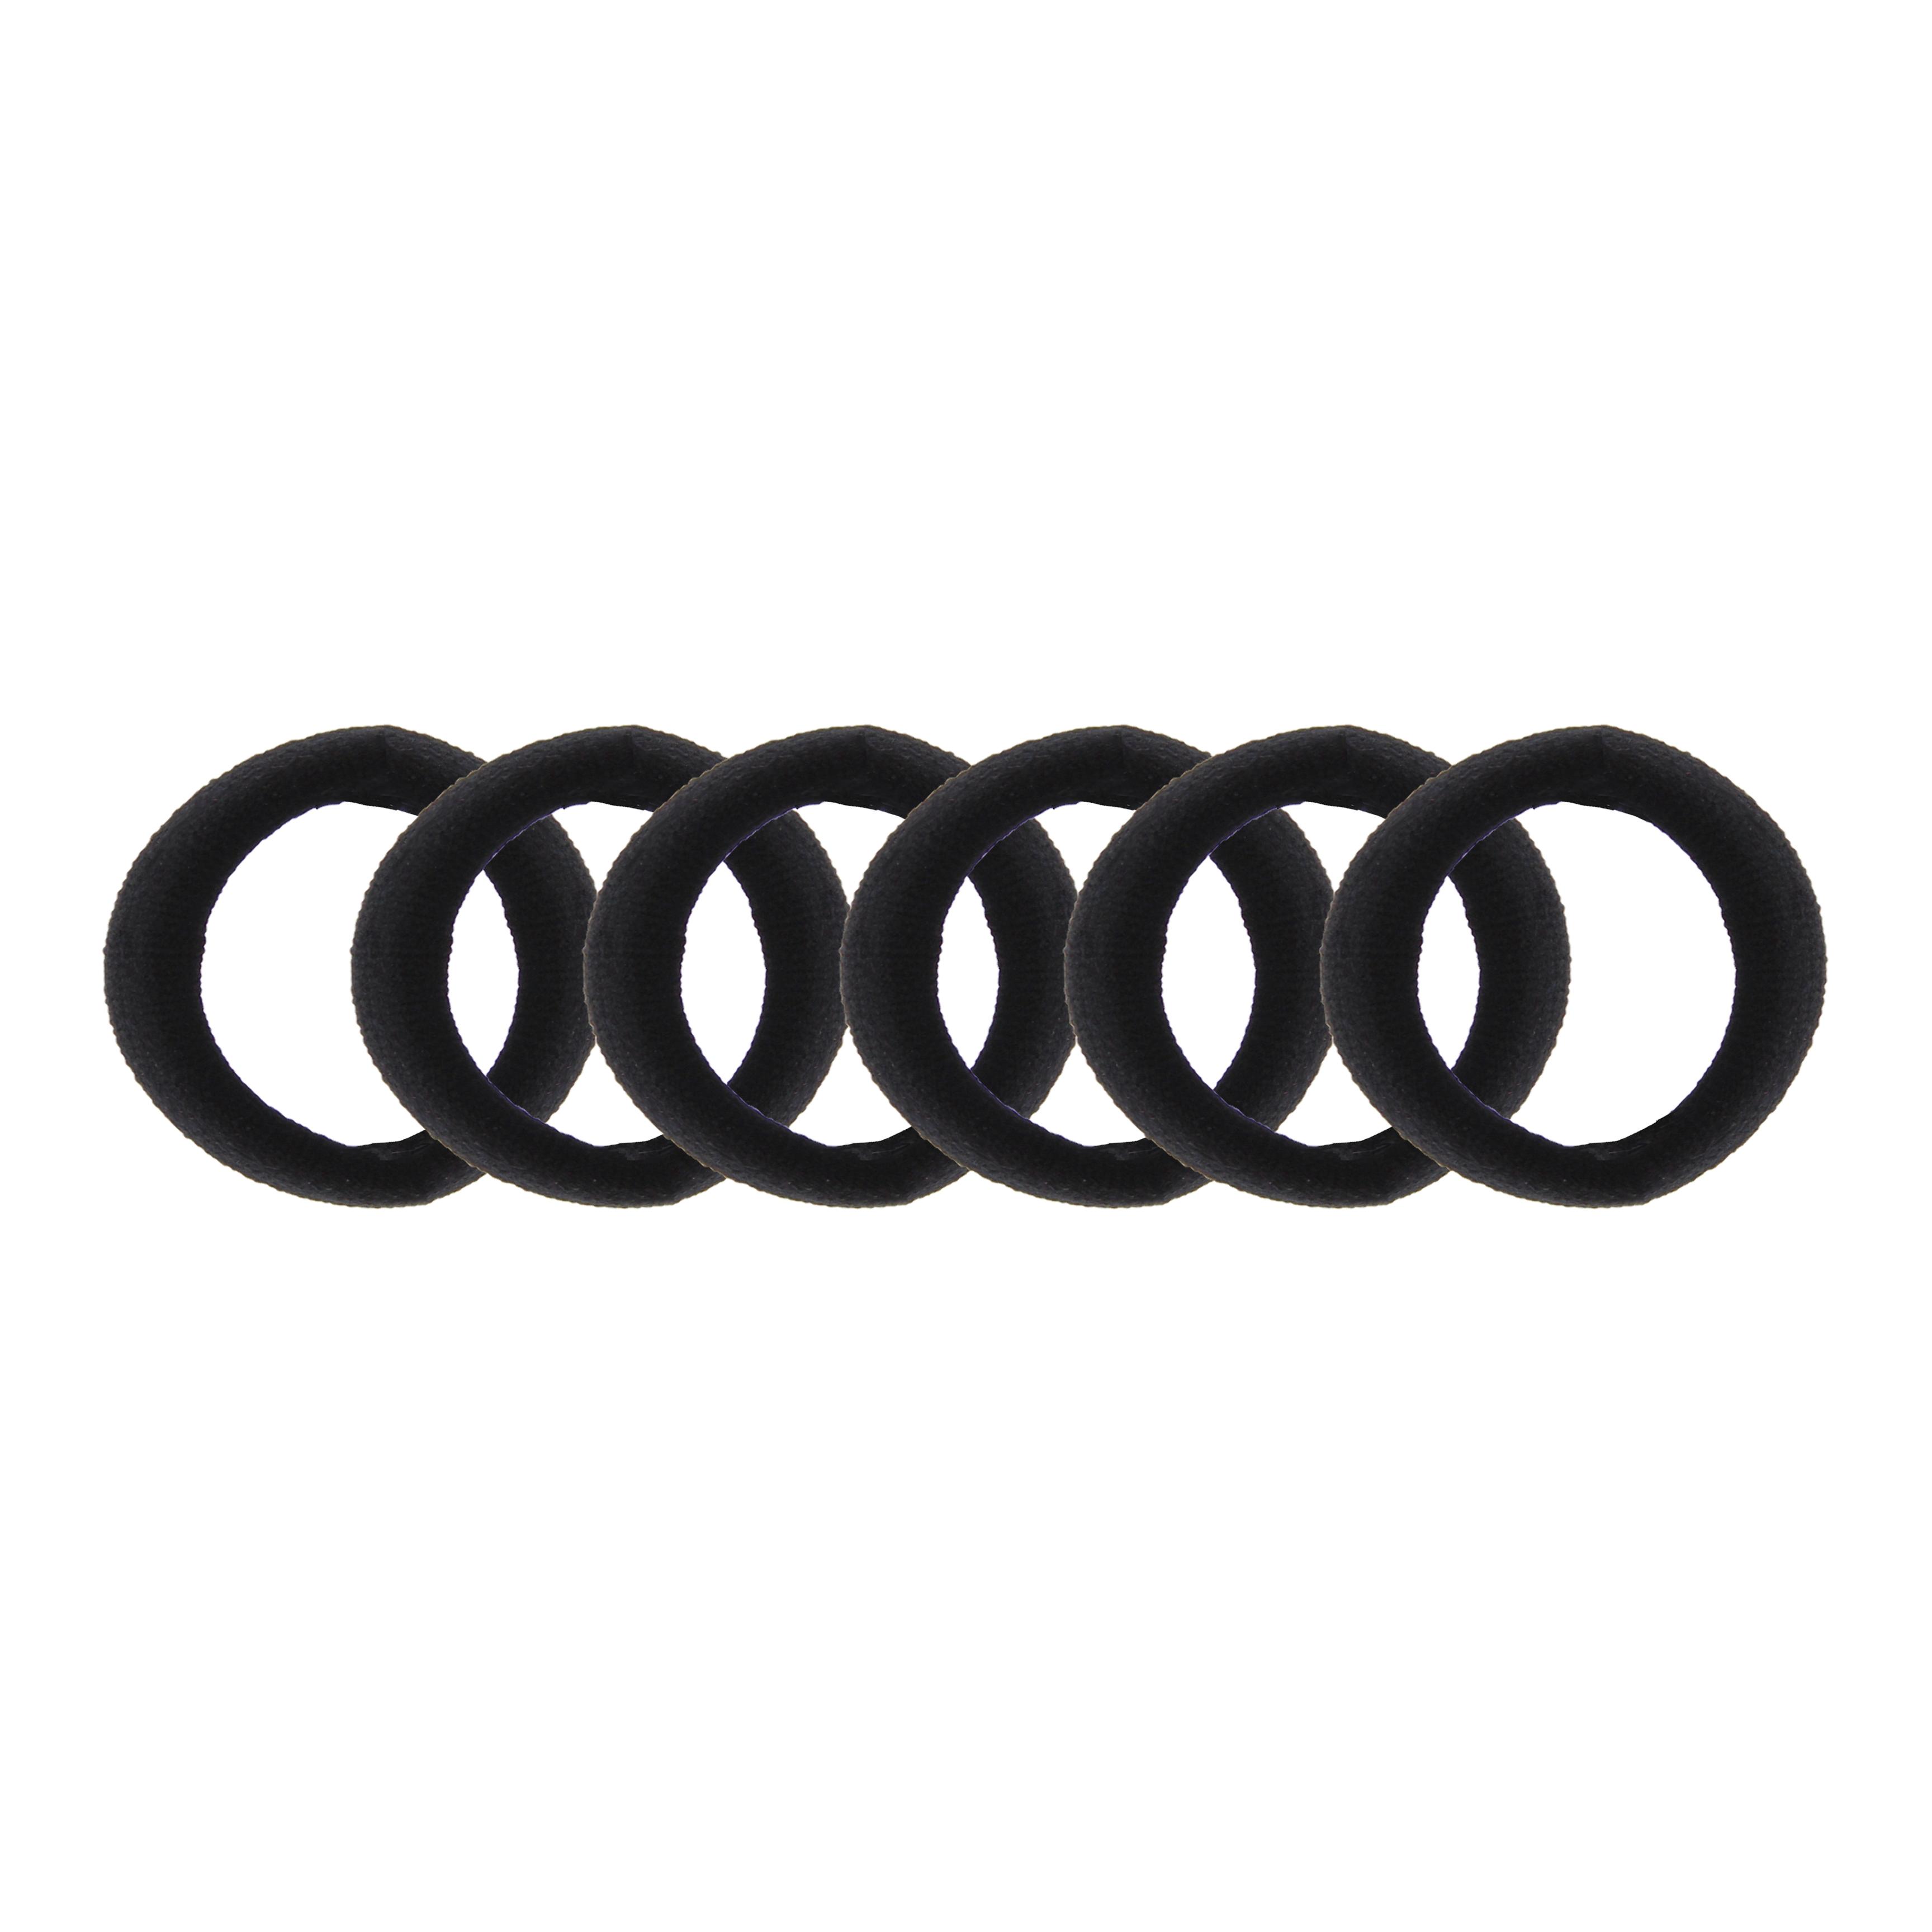 Zac/'s Alter Ego Set of 36 Endless Elastics Hair Bobbles Elastic Bands Hair